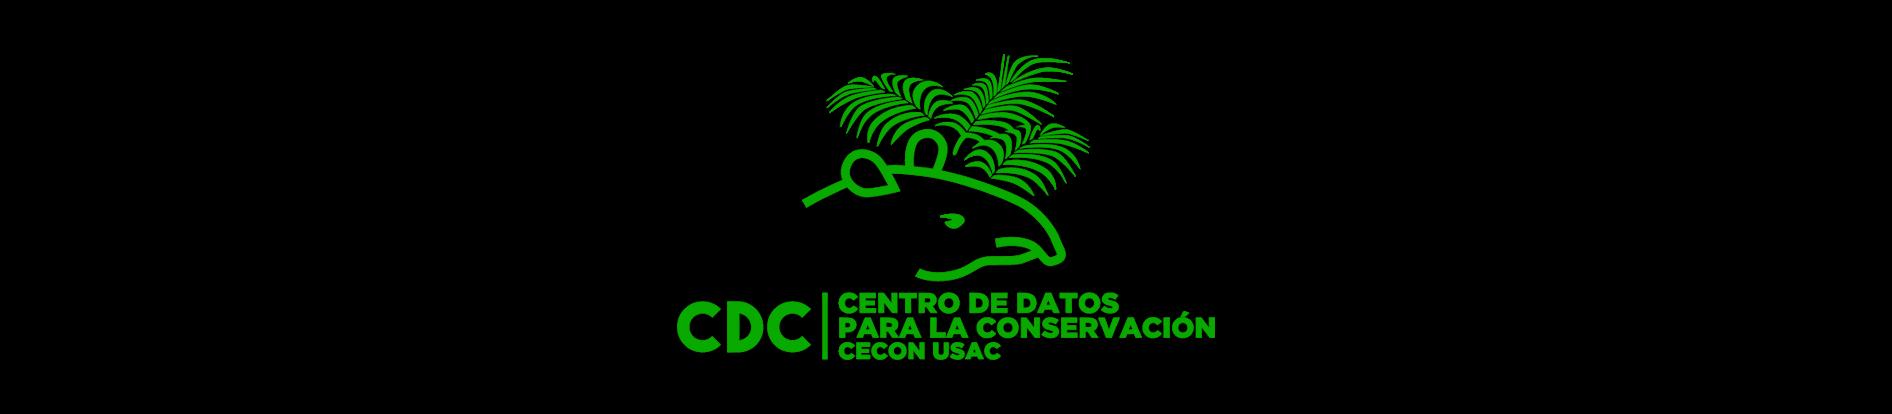 Centro de Datos para la Conservación